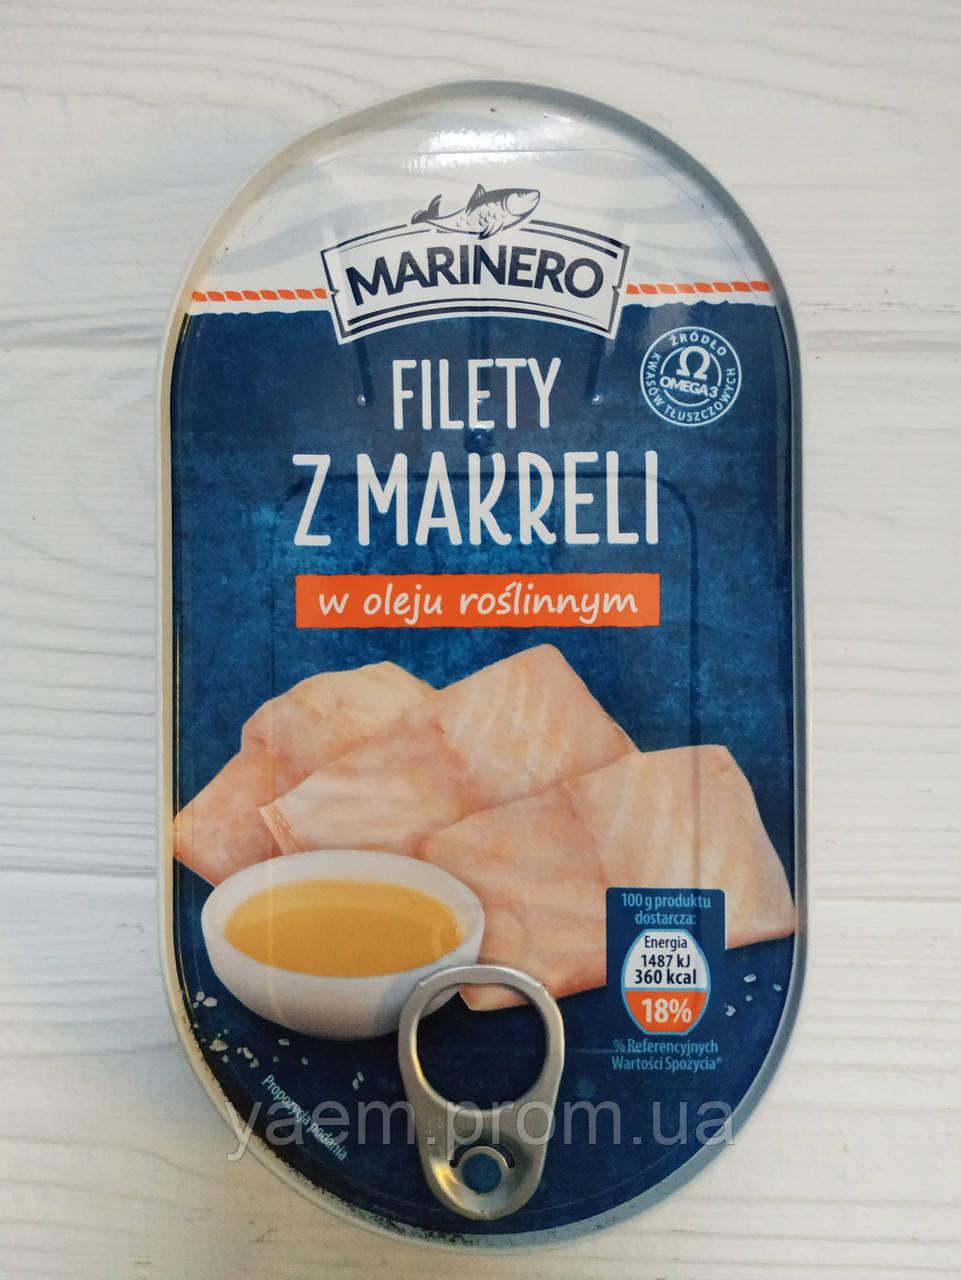 Филе макрели в масле Marinero Filety z makrelli 170гр (Польша)